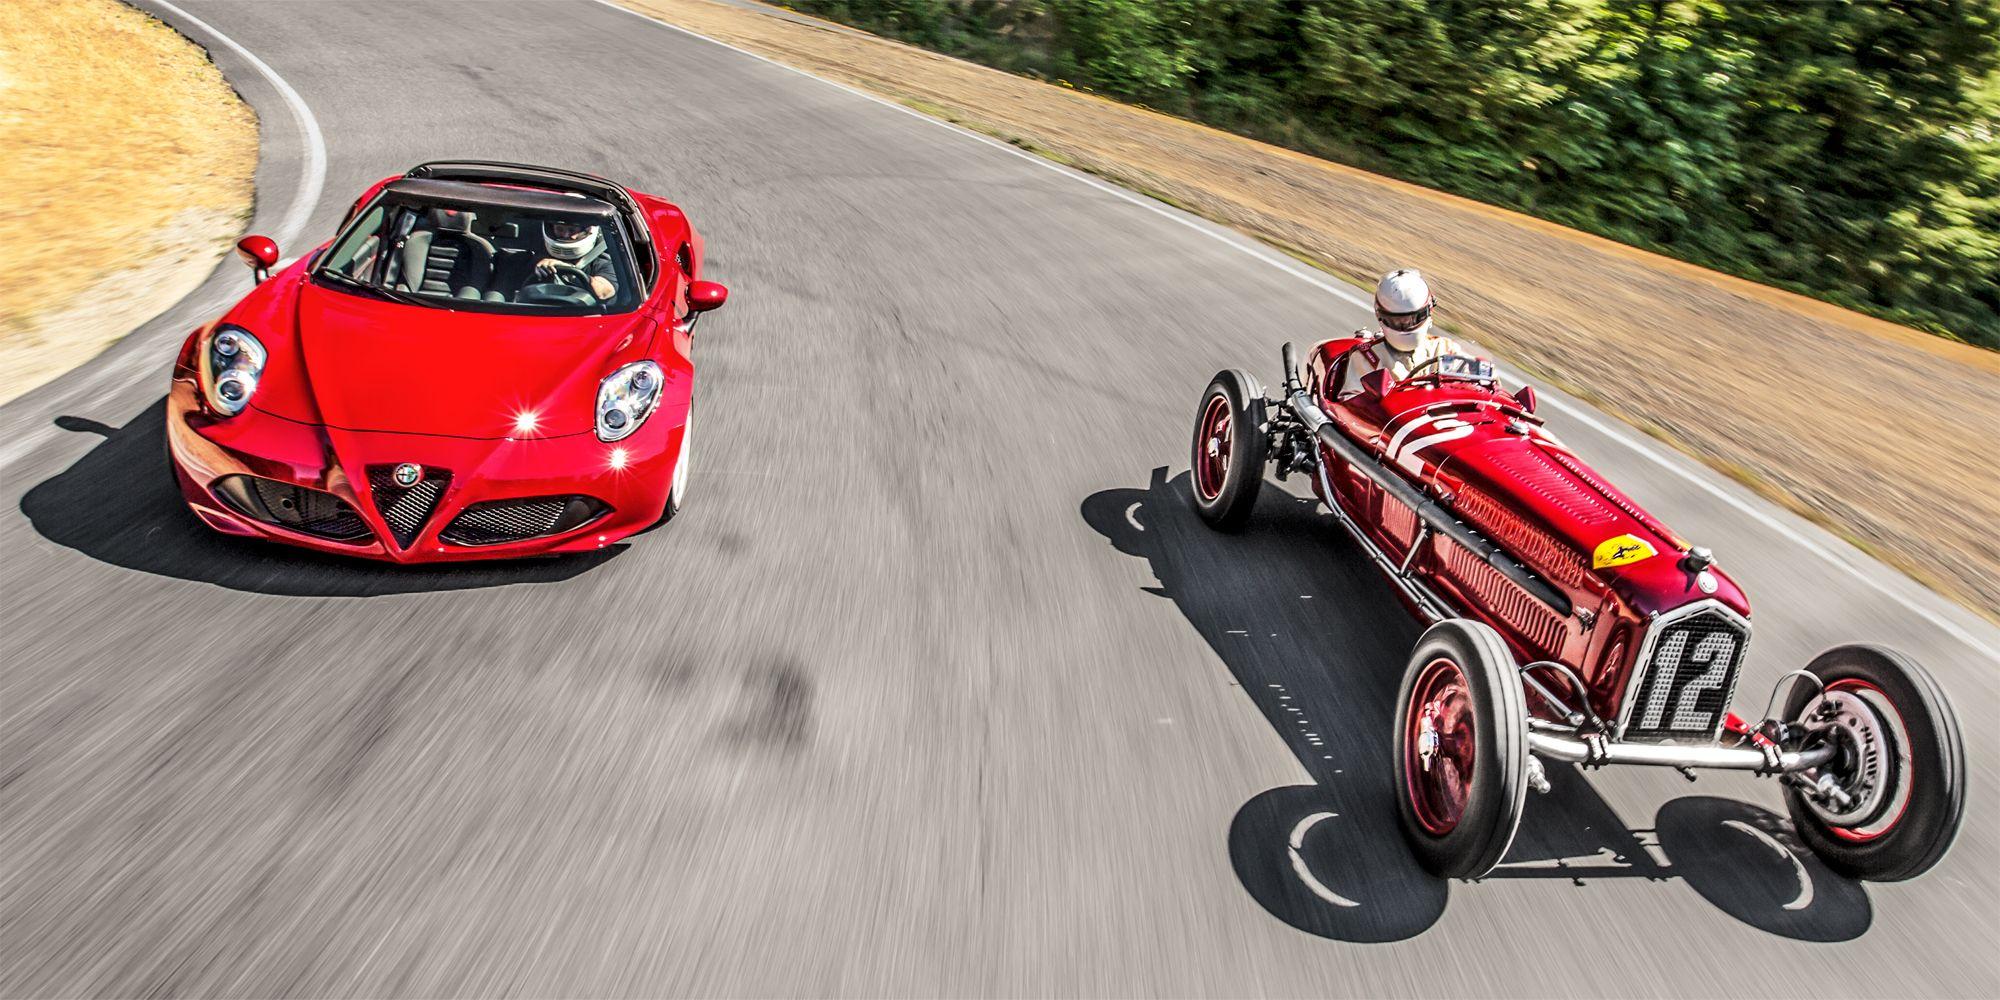 Driving The 1934 Alfa Romeo That Beat The Nazis